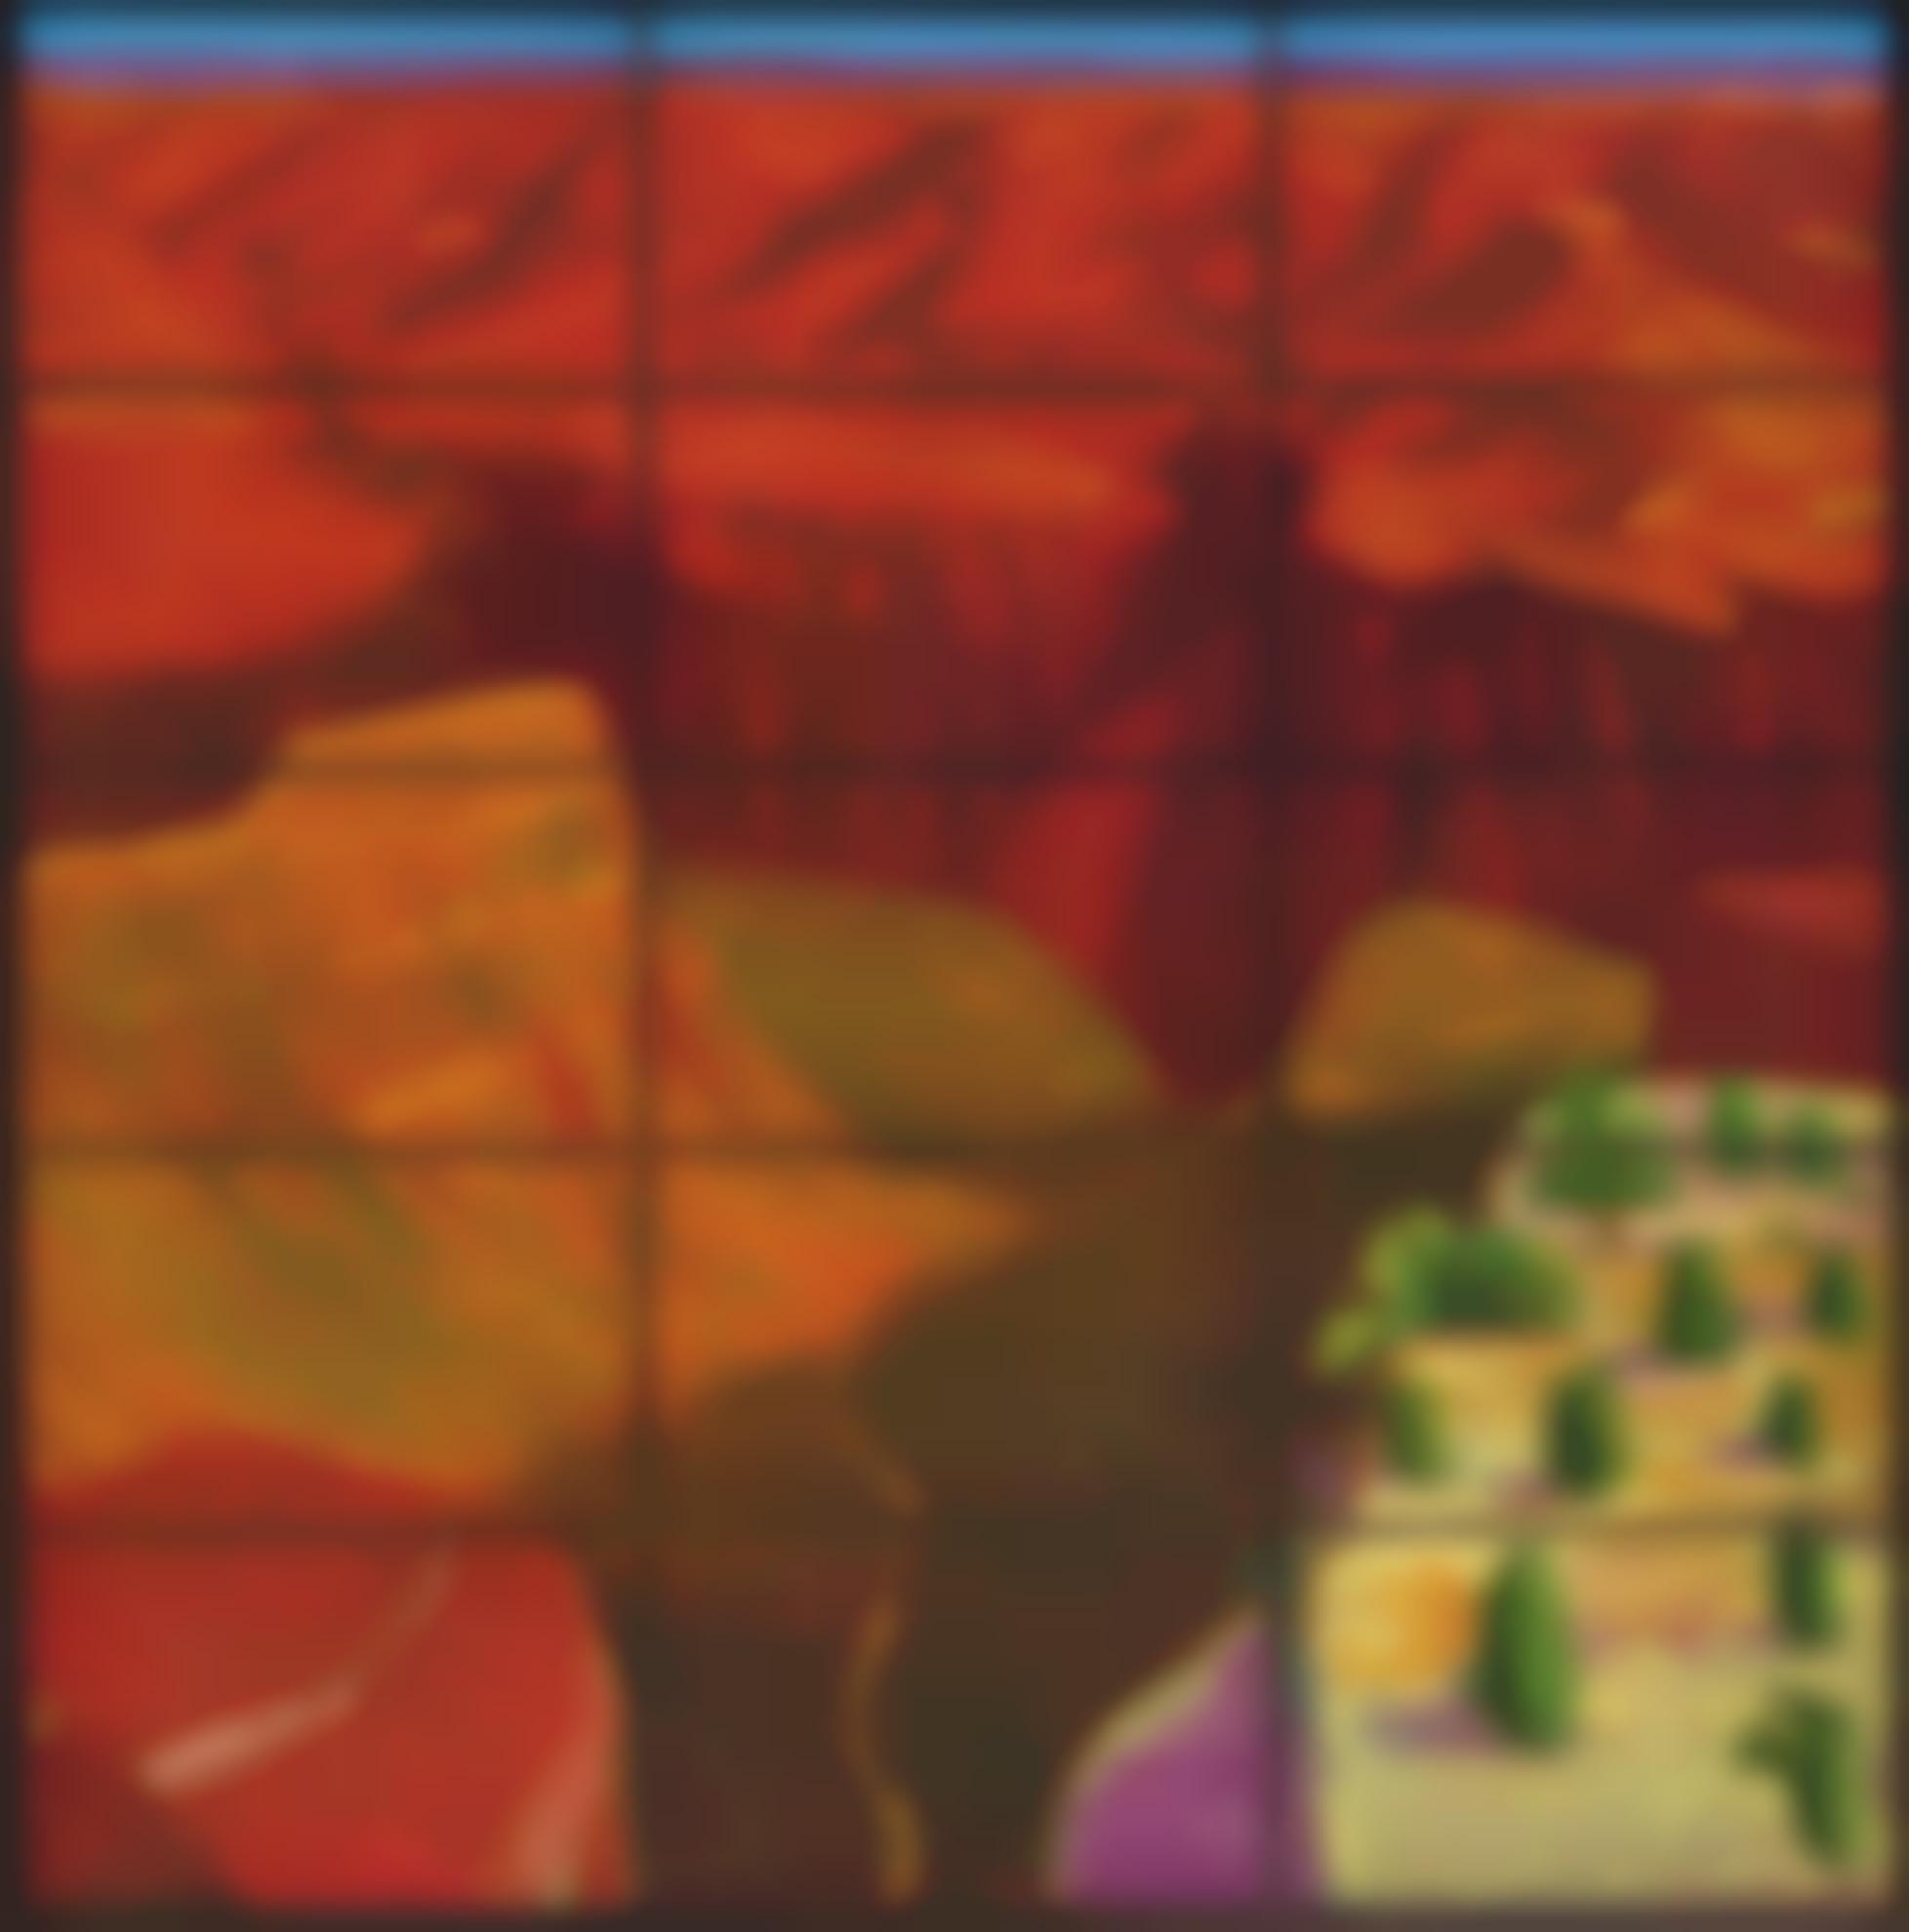 David Hockney-15 Canvas Study Of The Grand Canyon-1998